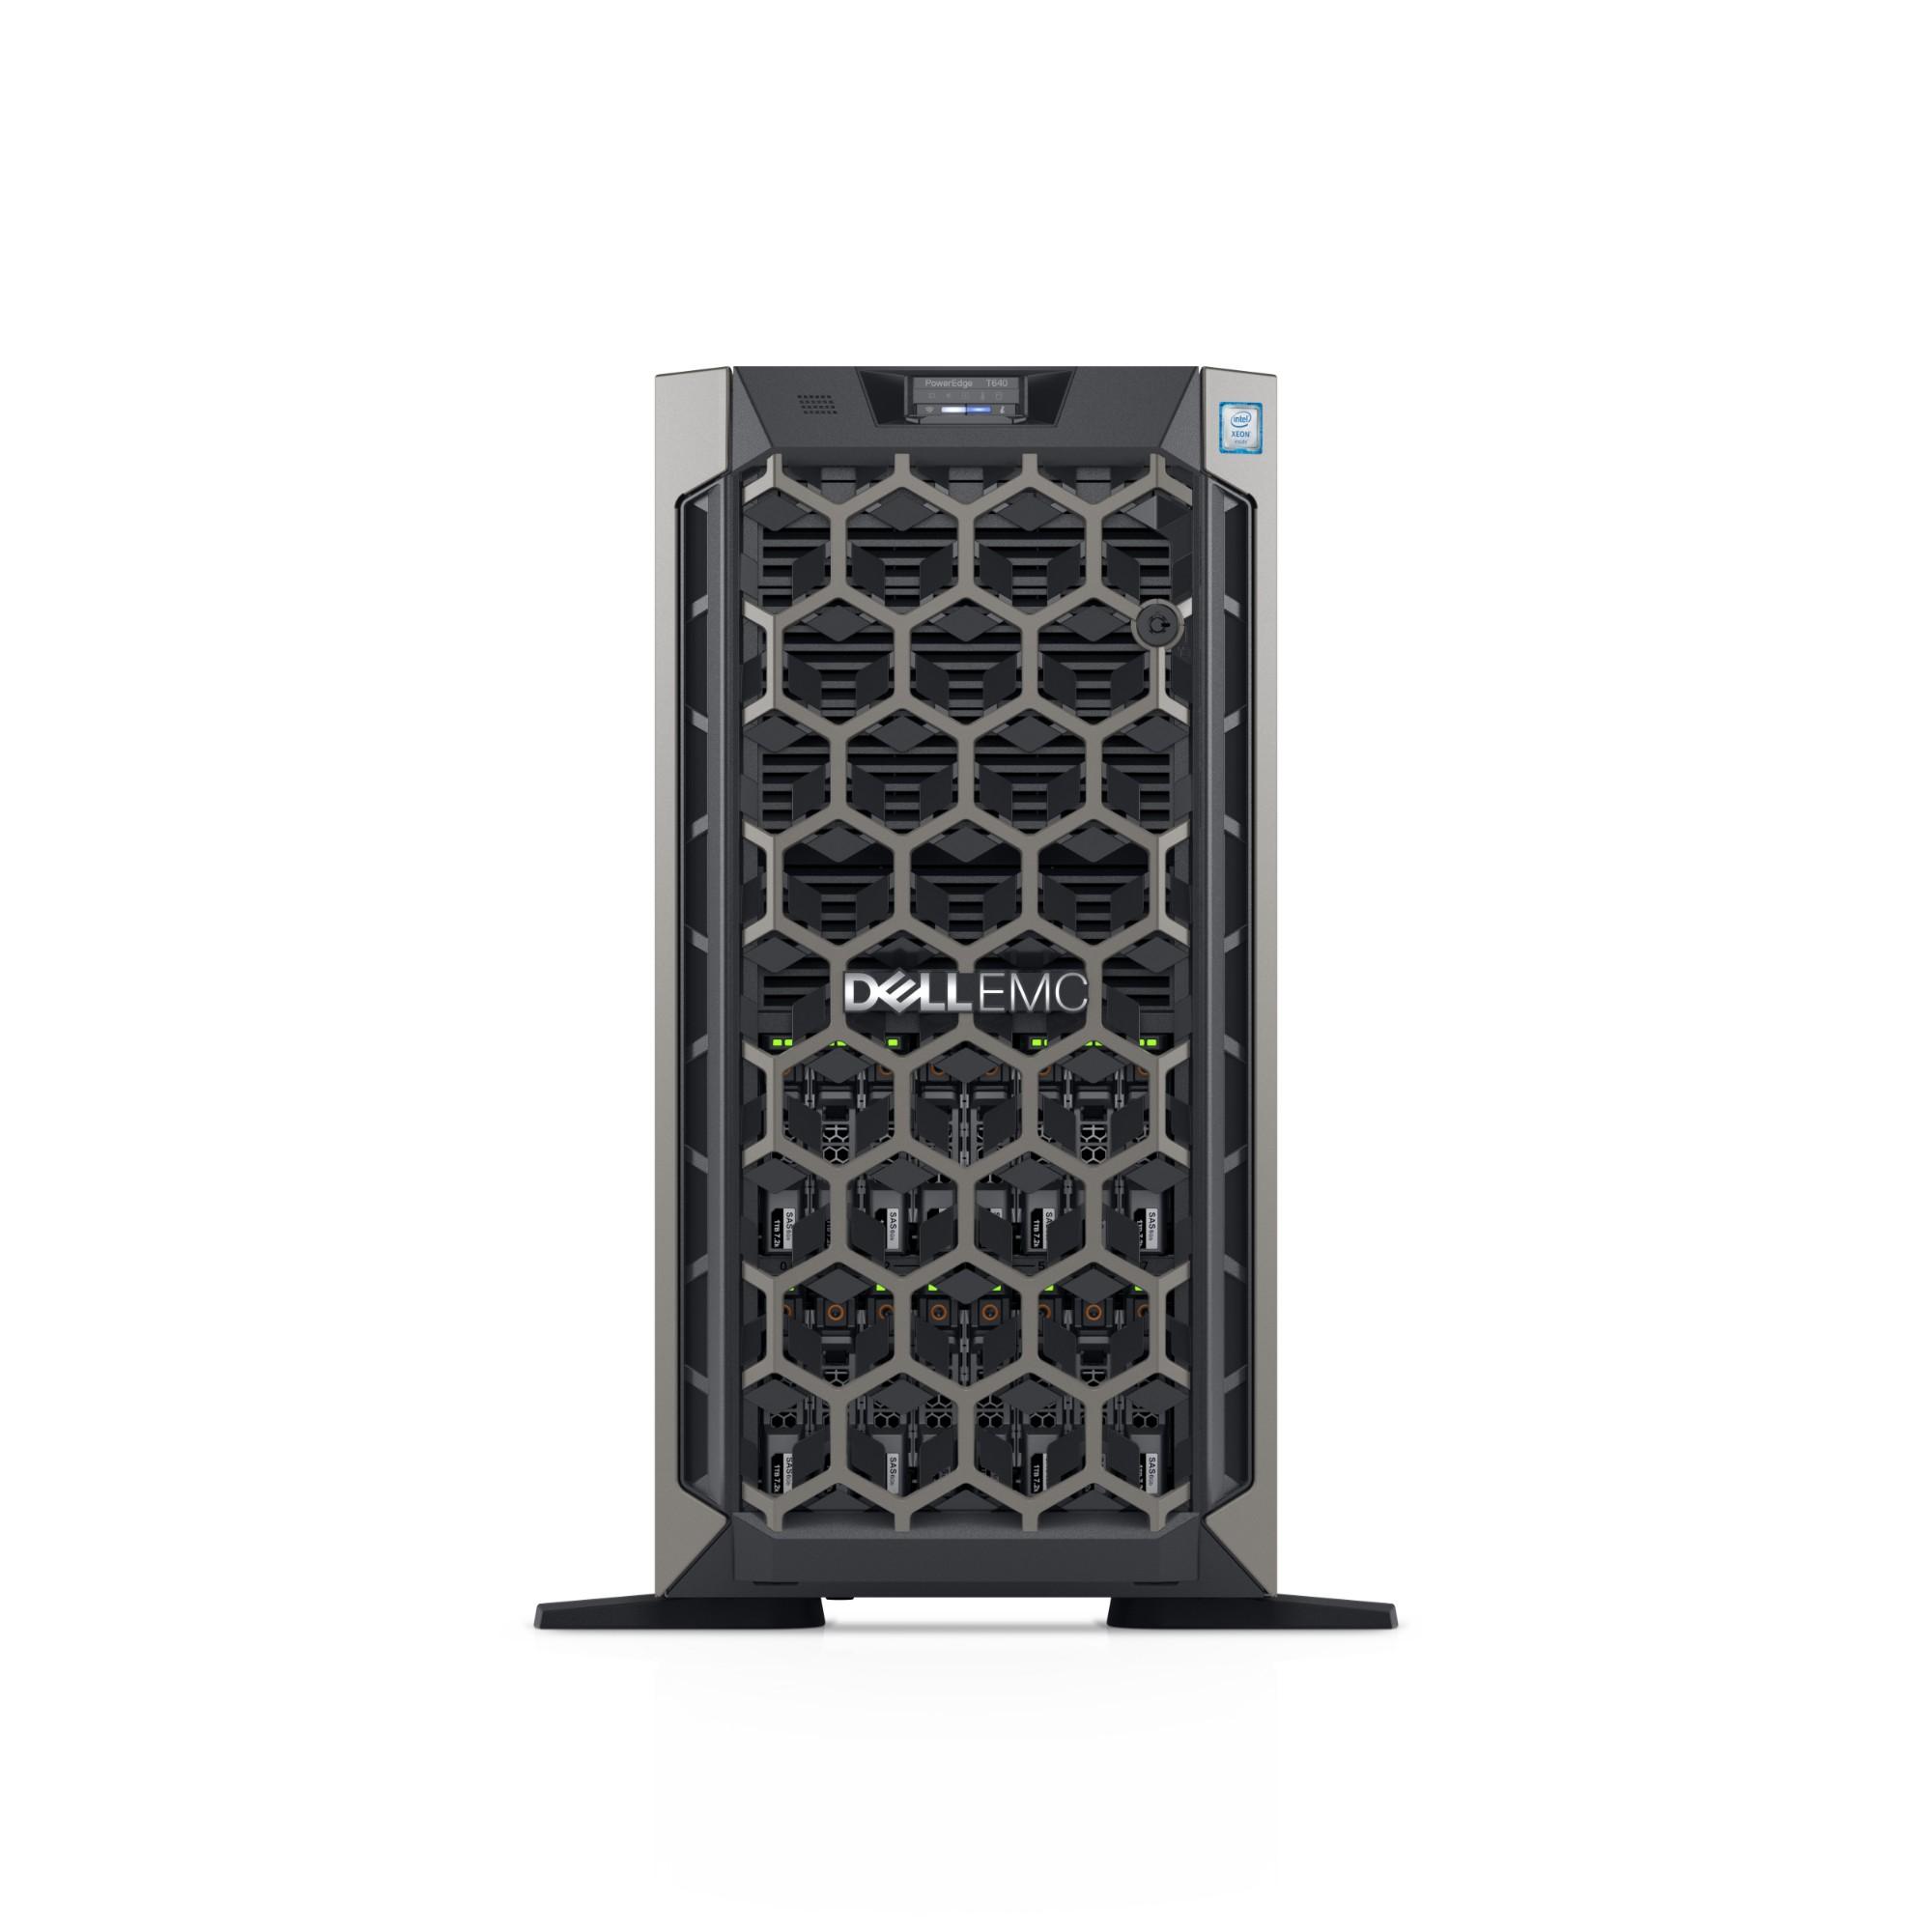 DELL POWEREDGE T640 SERVER 2.2 GHZ INTEL XEON SILVER 4214 TOWER (5U) 750 W